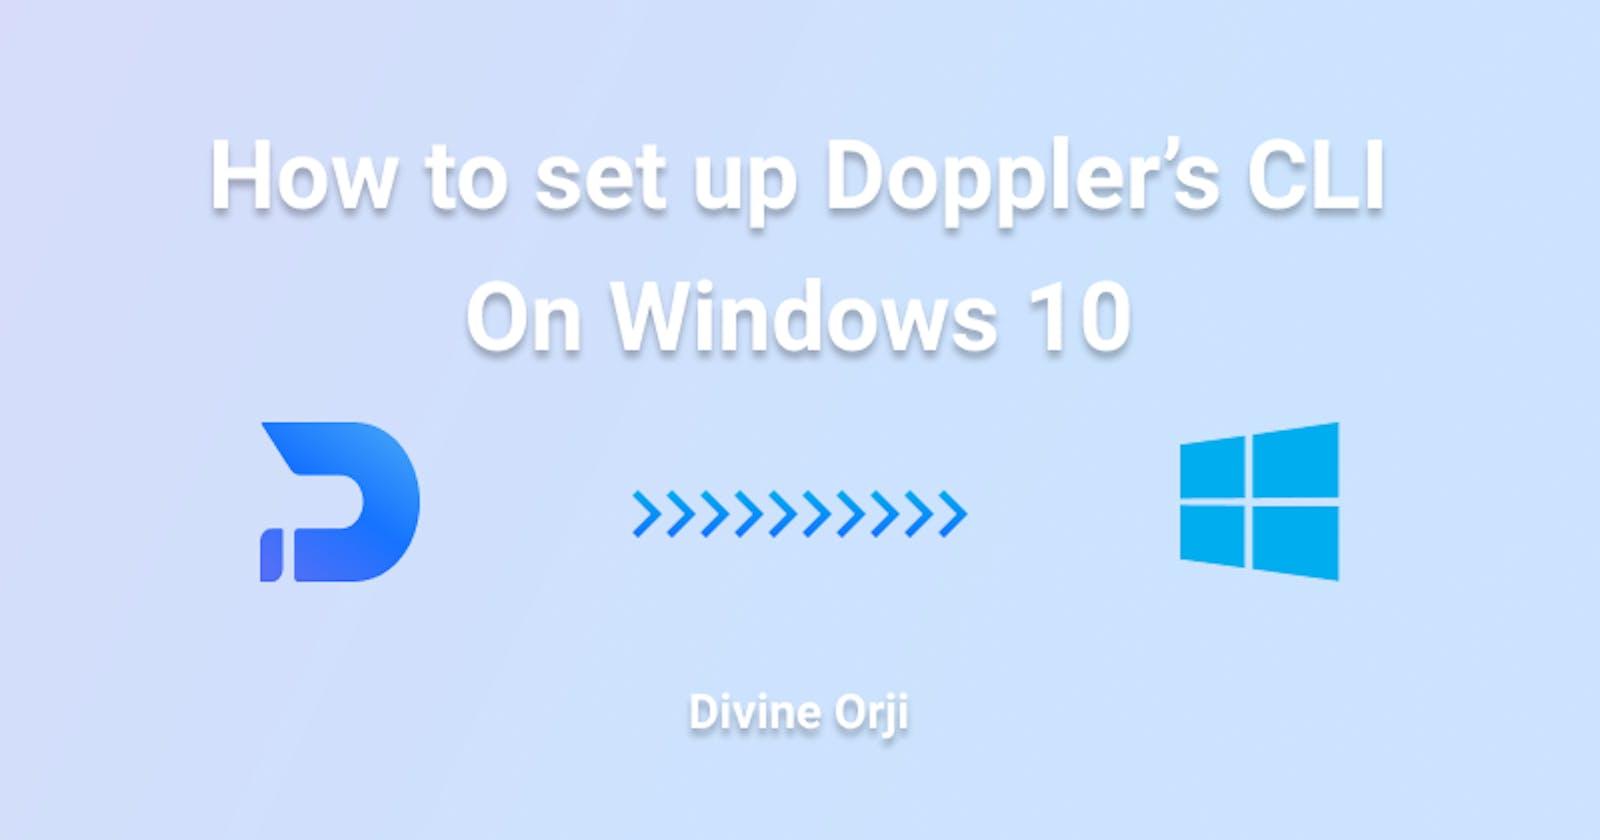 How to set up Doppler's CLI on Windows 10